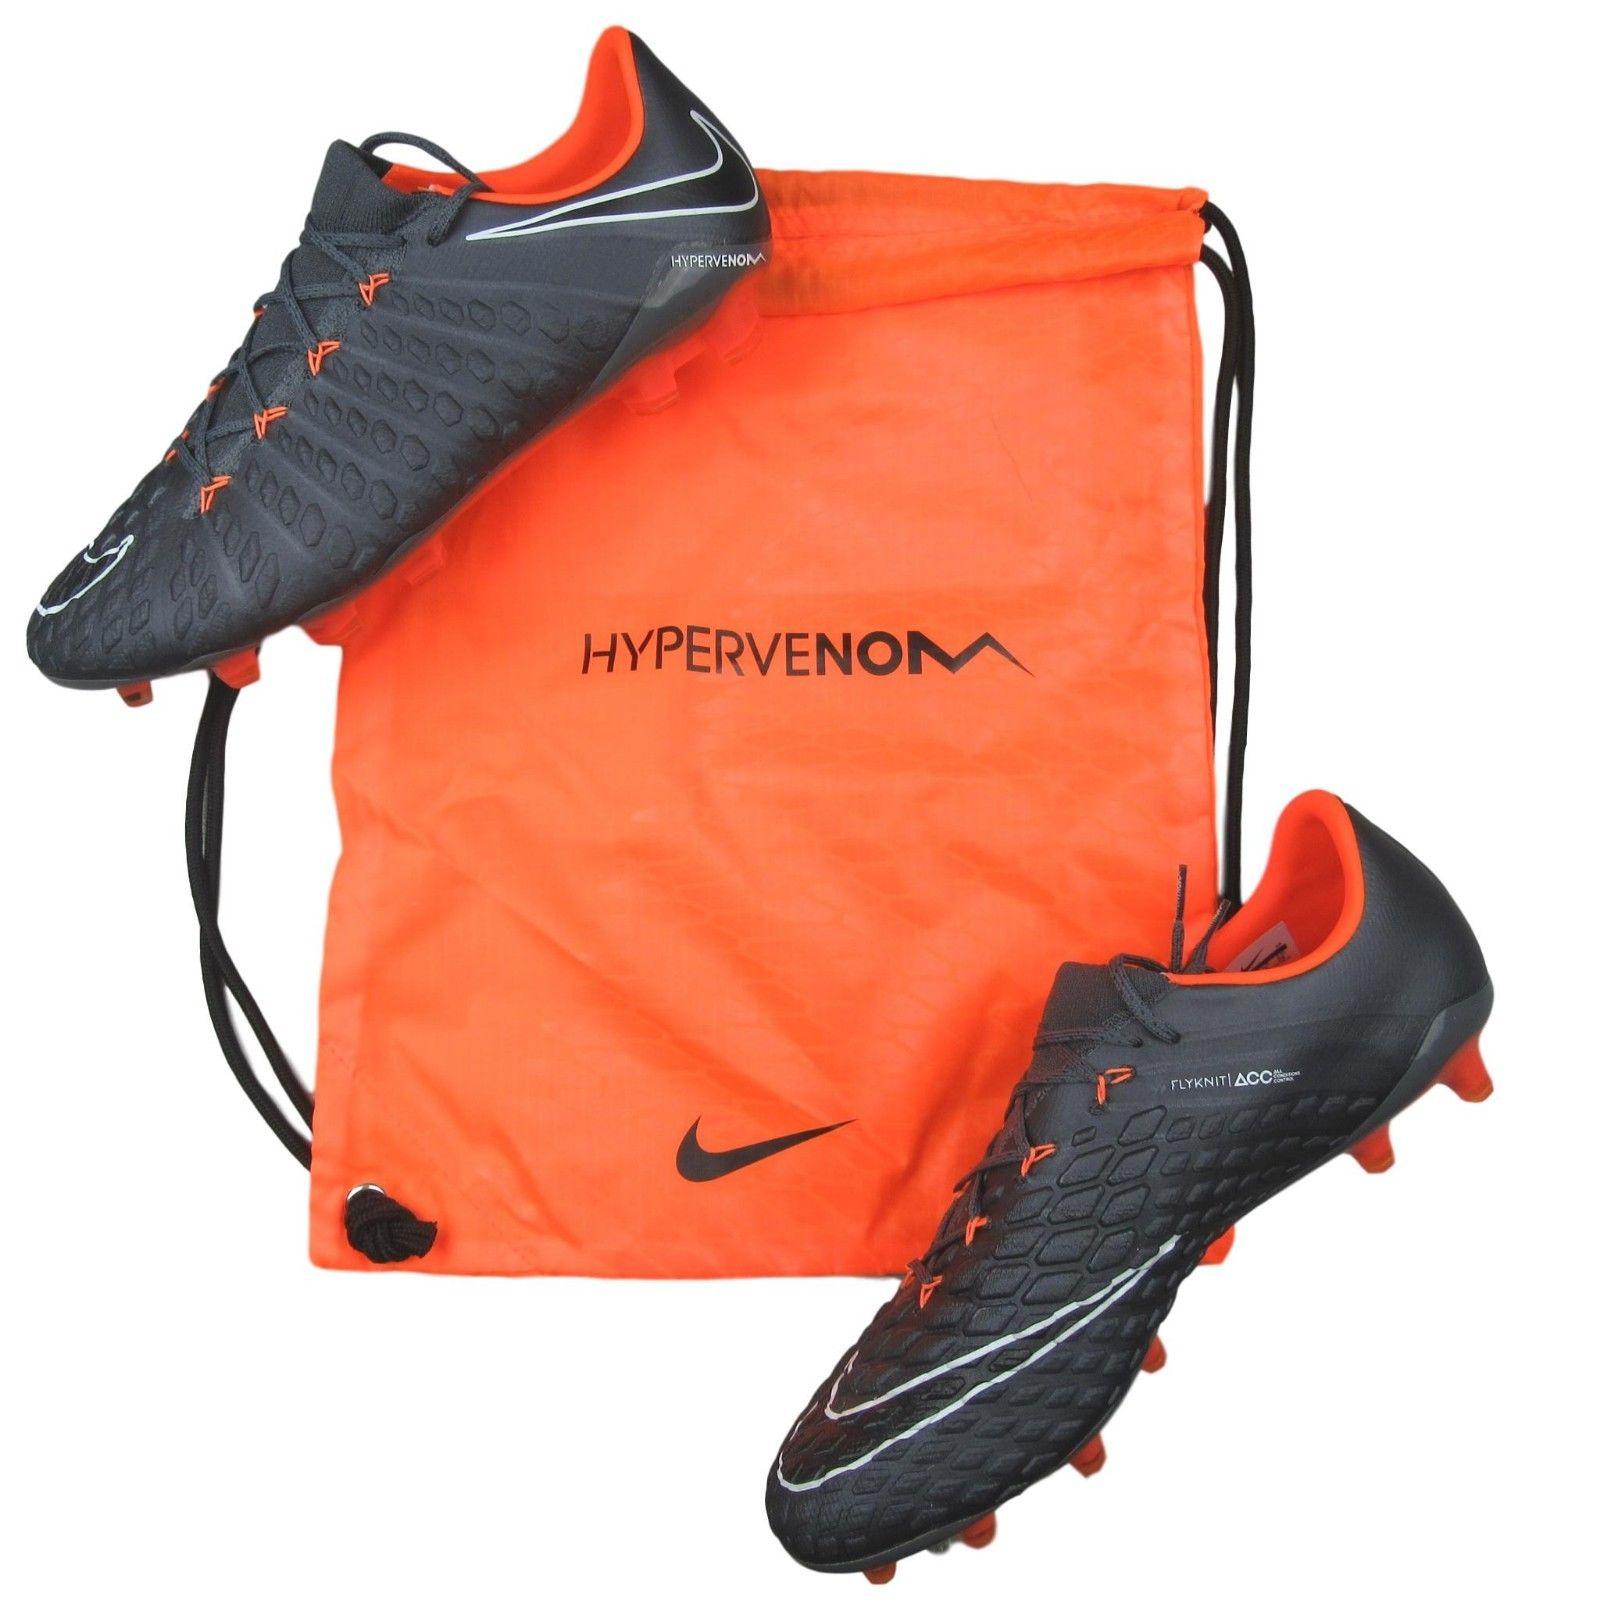 d3d936360fe9 Nike Phantom Elite 3 III FG Soccer Cleats Size 11 Dark Grey Orange ...